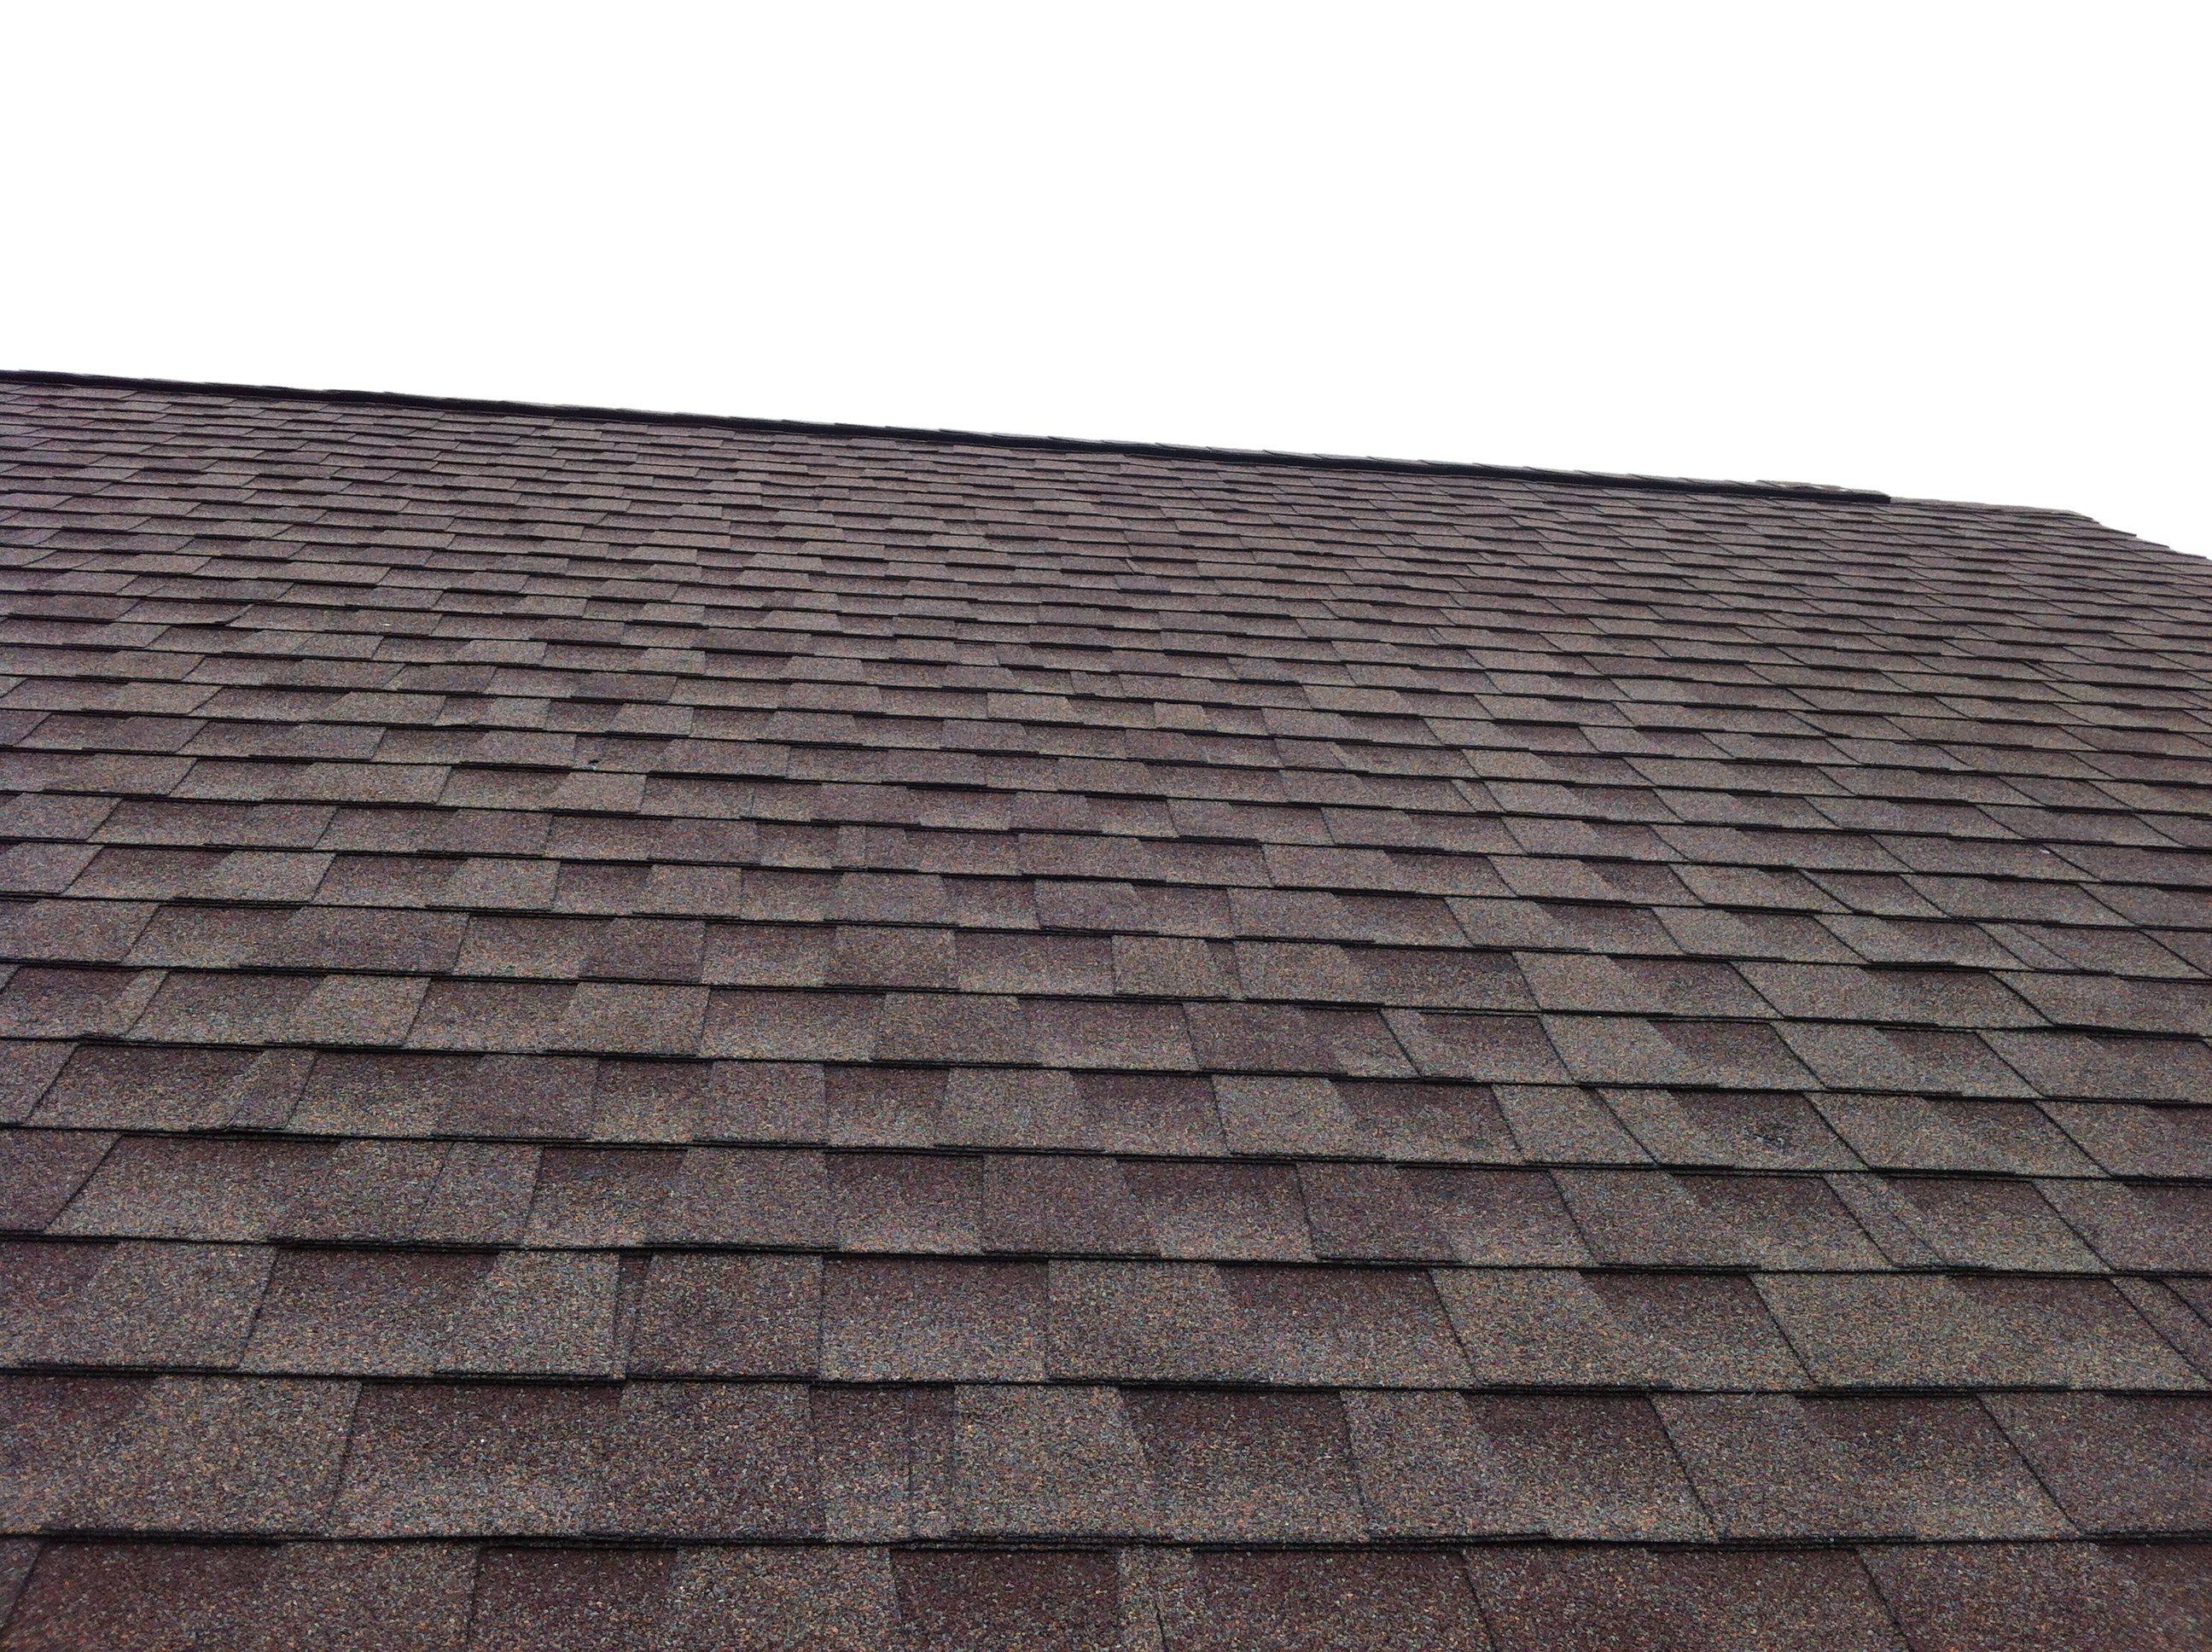 Tamko roofing shingles legacy roofing for Tamko shingles